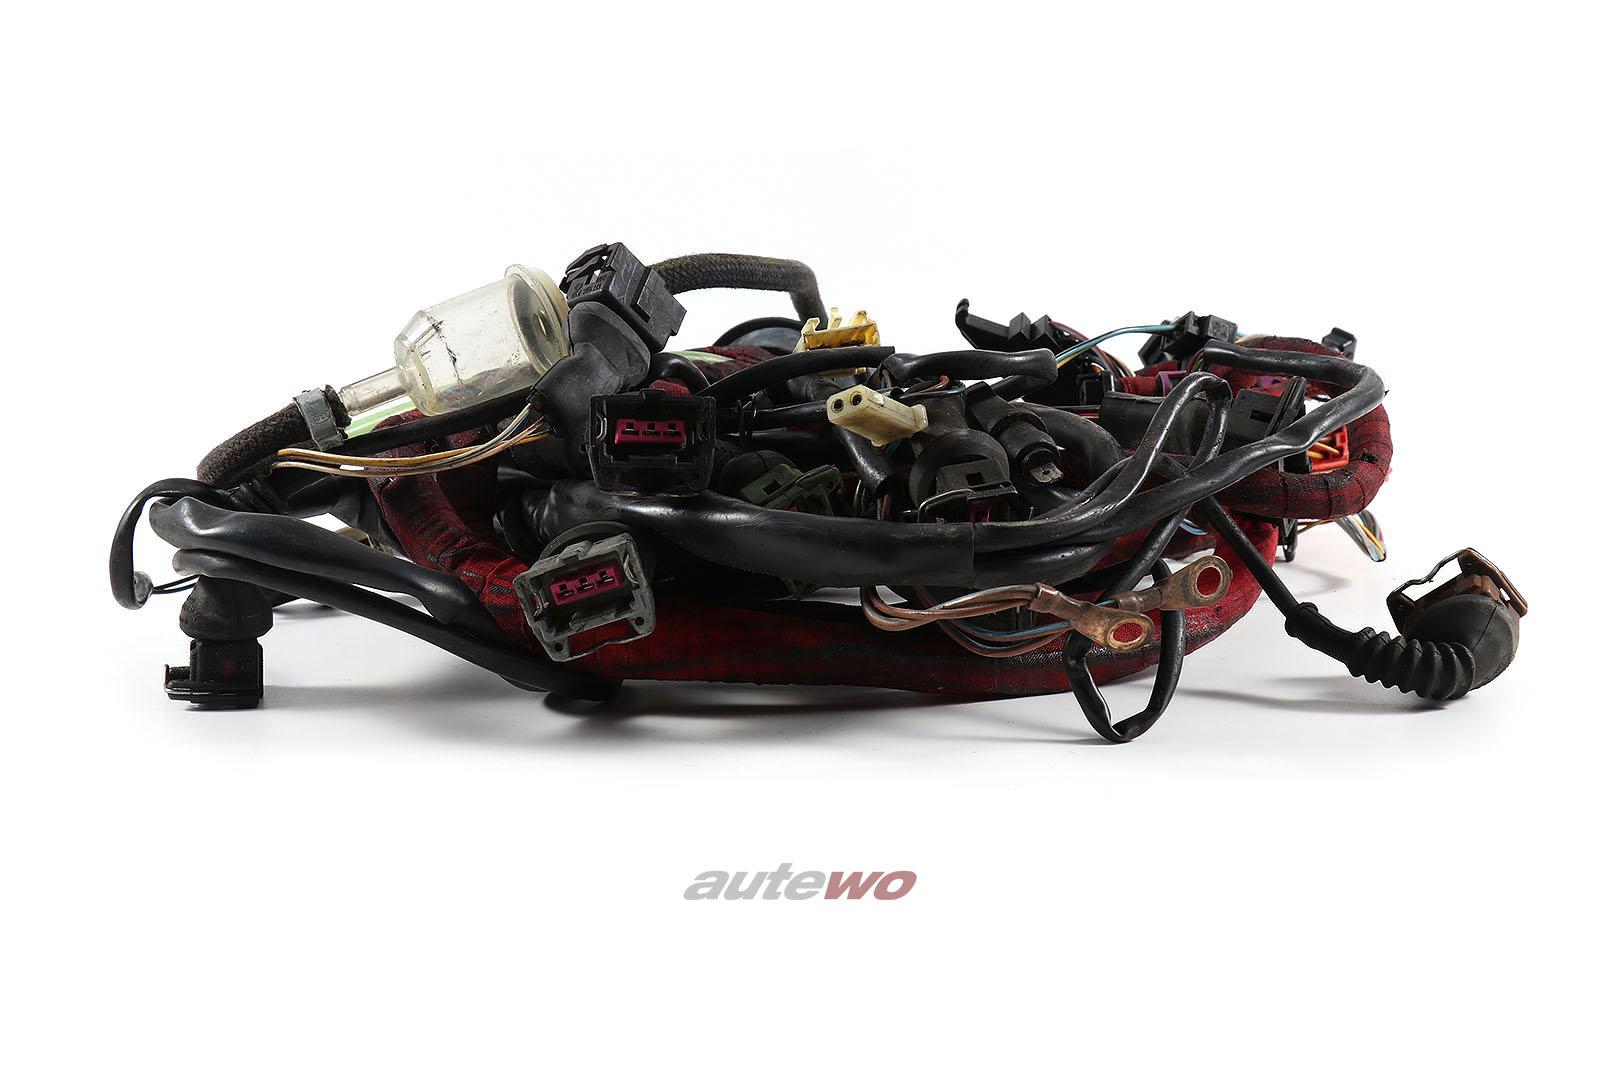 443971713G Audi 100/200 Typ 44 2.2l 5 Zylinder 10V Turbo MC2 Motorkabelbaum